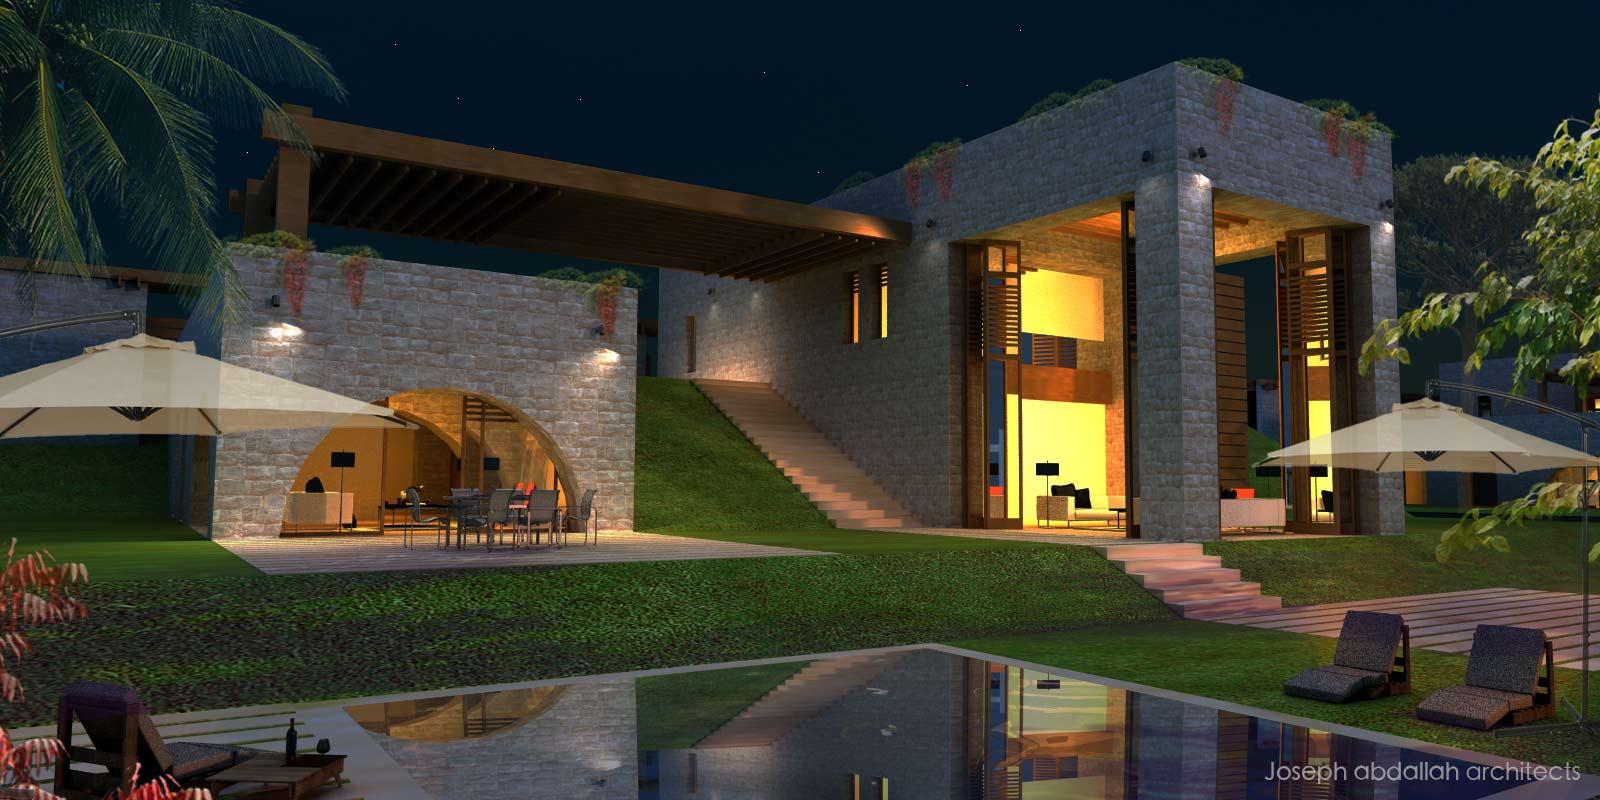 community-ajaltoun-villa-architecture-landscape-bnache-lebanon-joseph-abdallah-architects-2